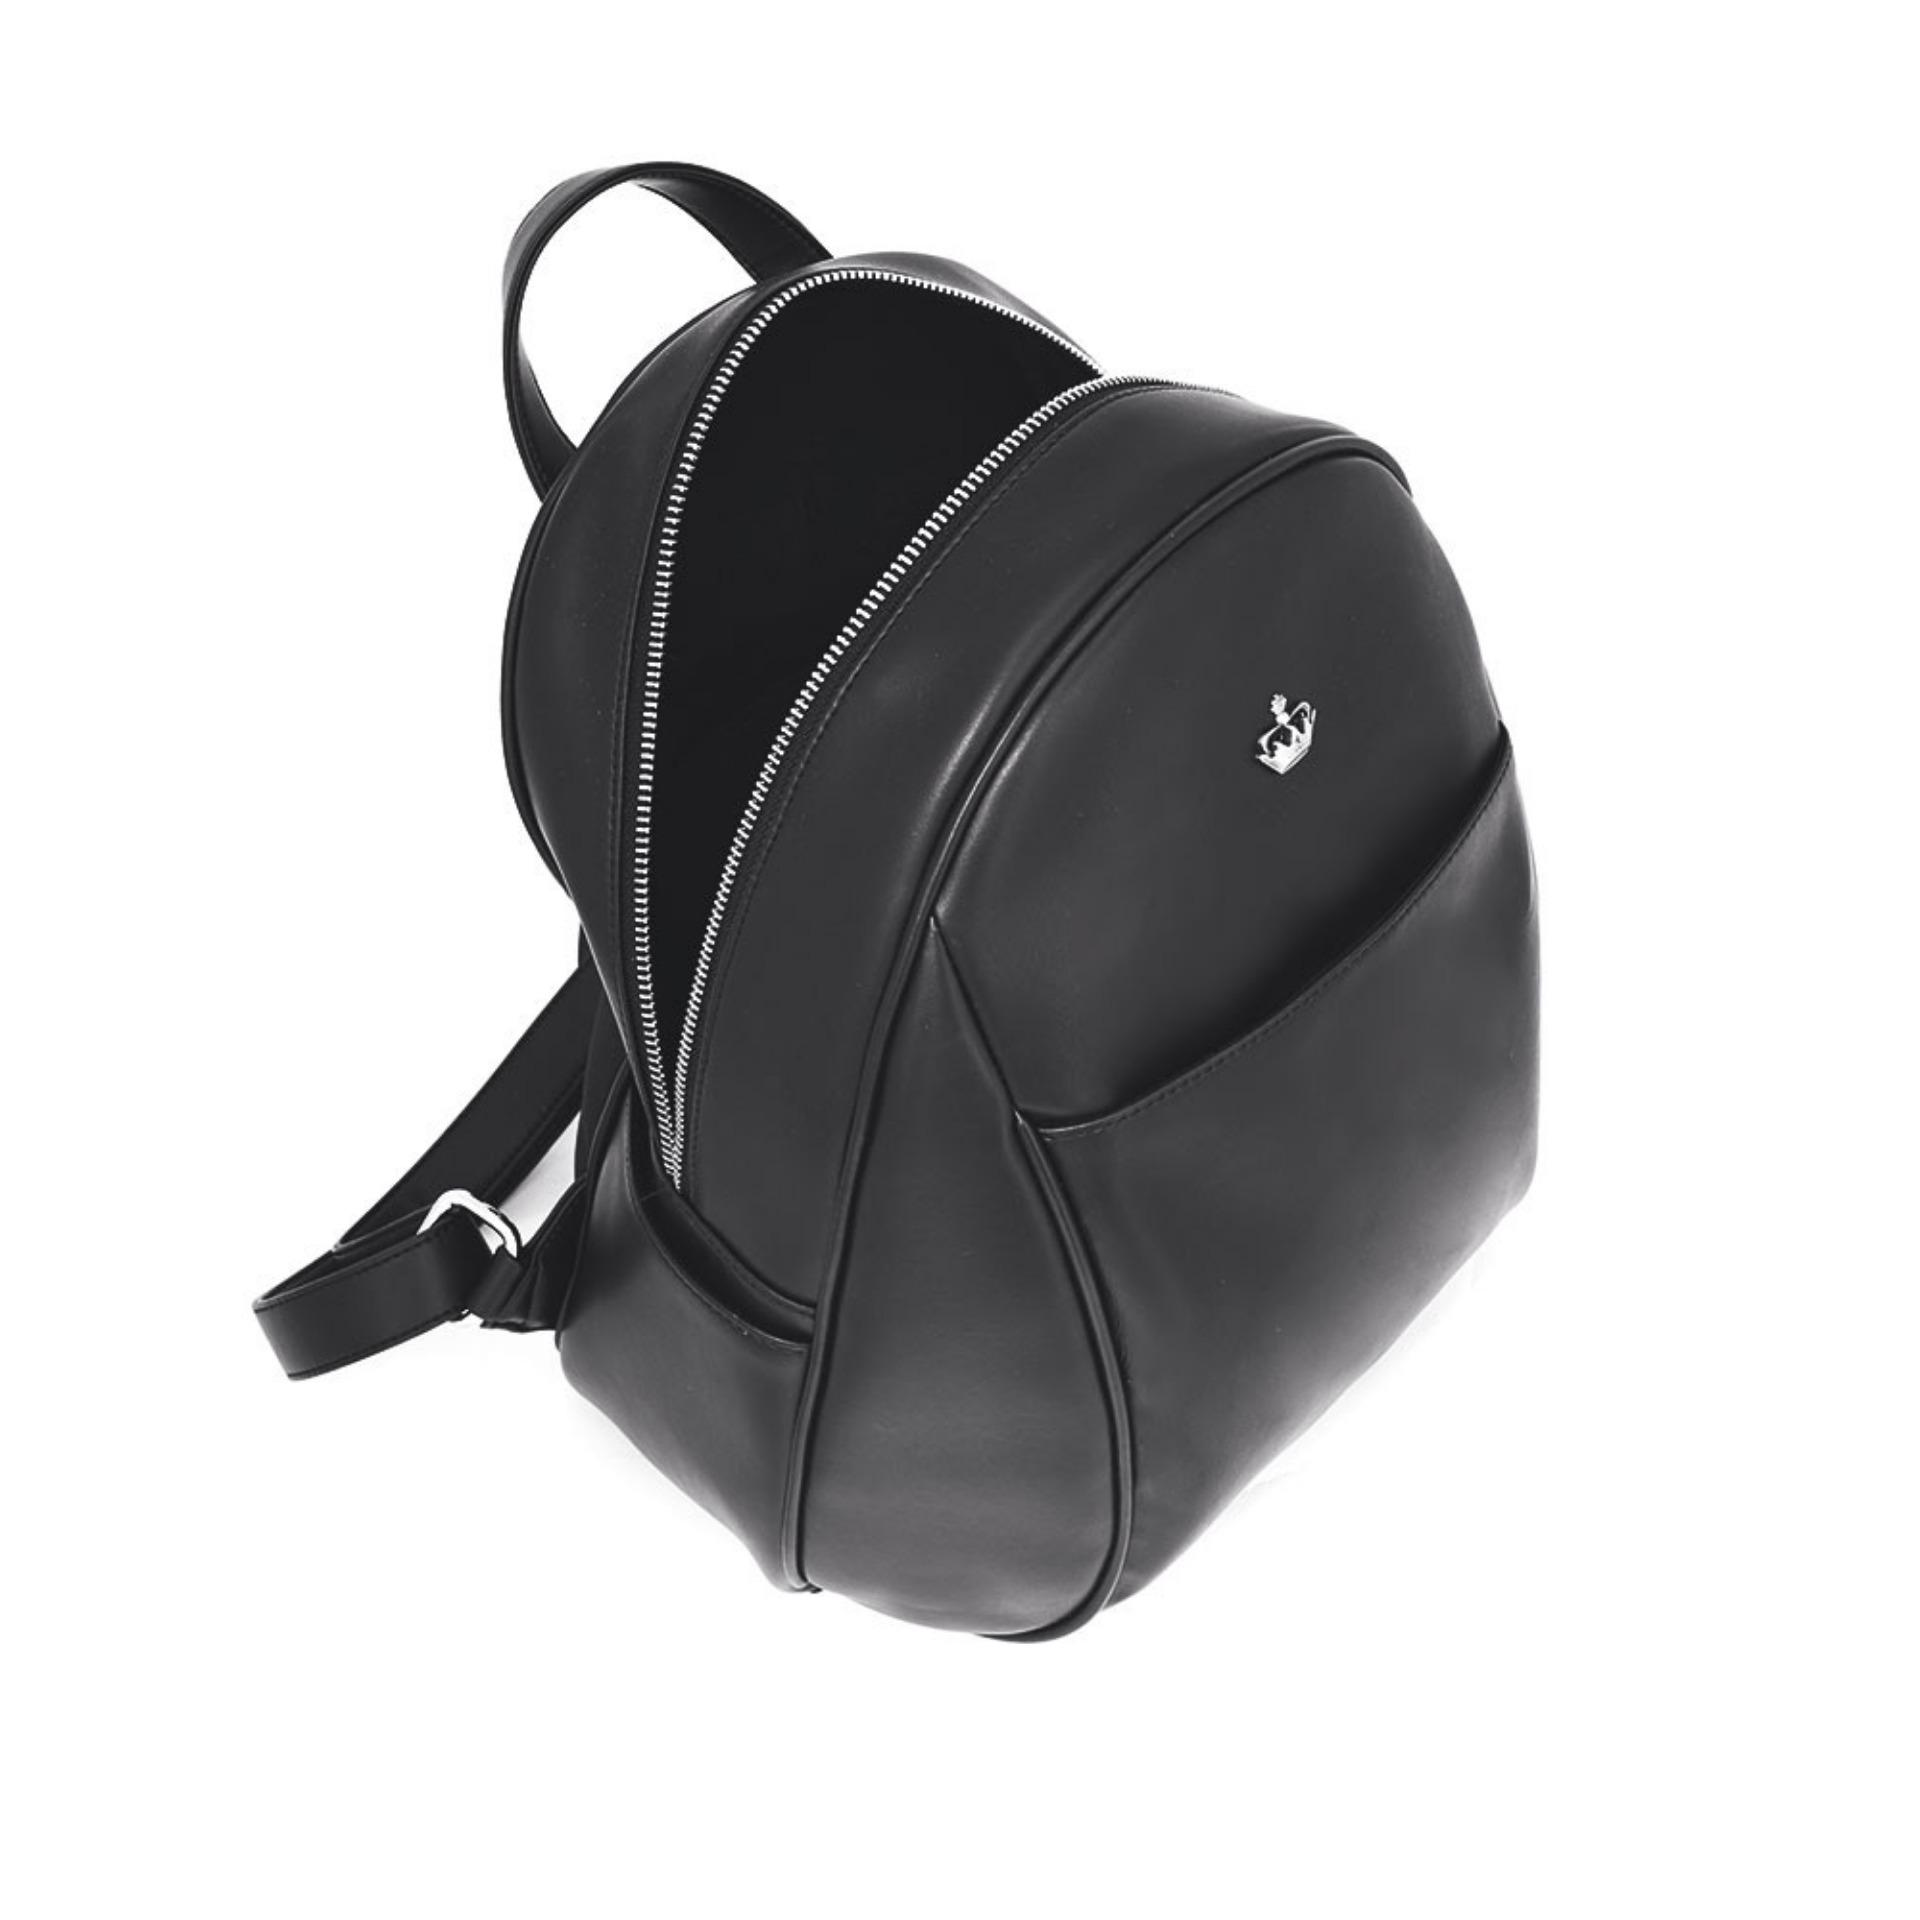 Fitur Sophie Paris Tas Ransel Backpack Import Branded Madec Bag Lenovo Original T4338b5 Hitam 5